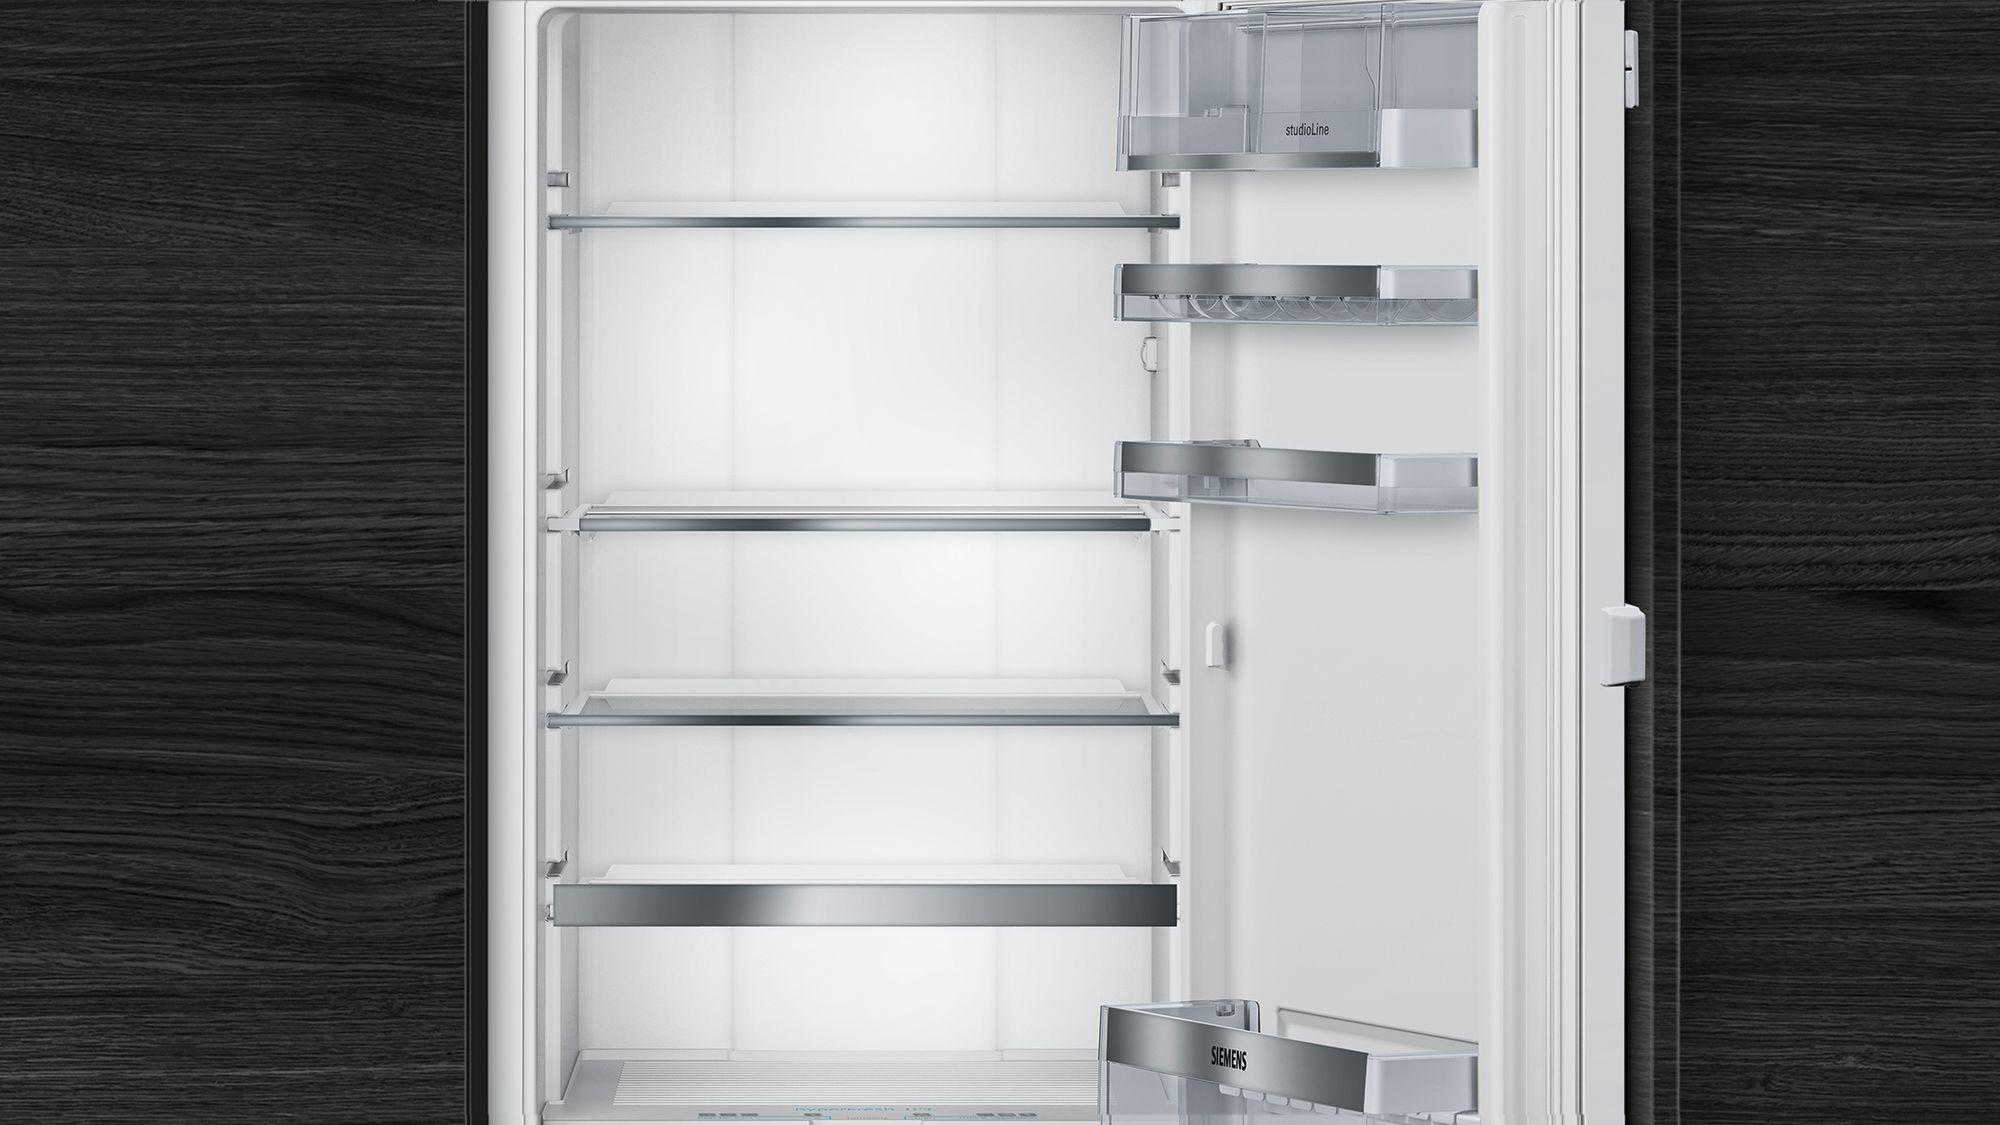 Siemens Studioline Kühlschrank : Siemens studioline ki fsd einbau kühlautomat inkl jahre